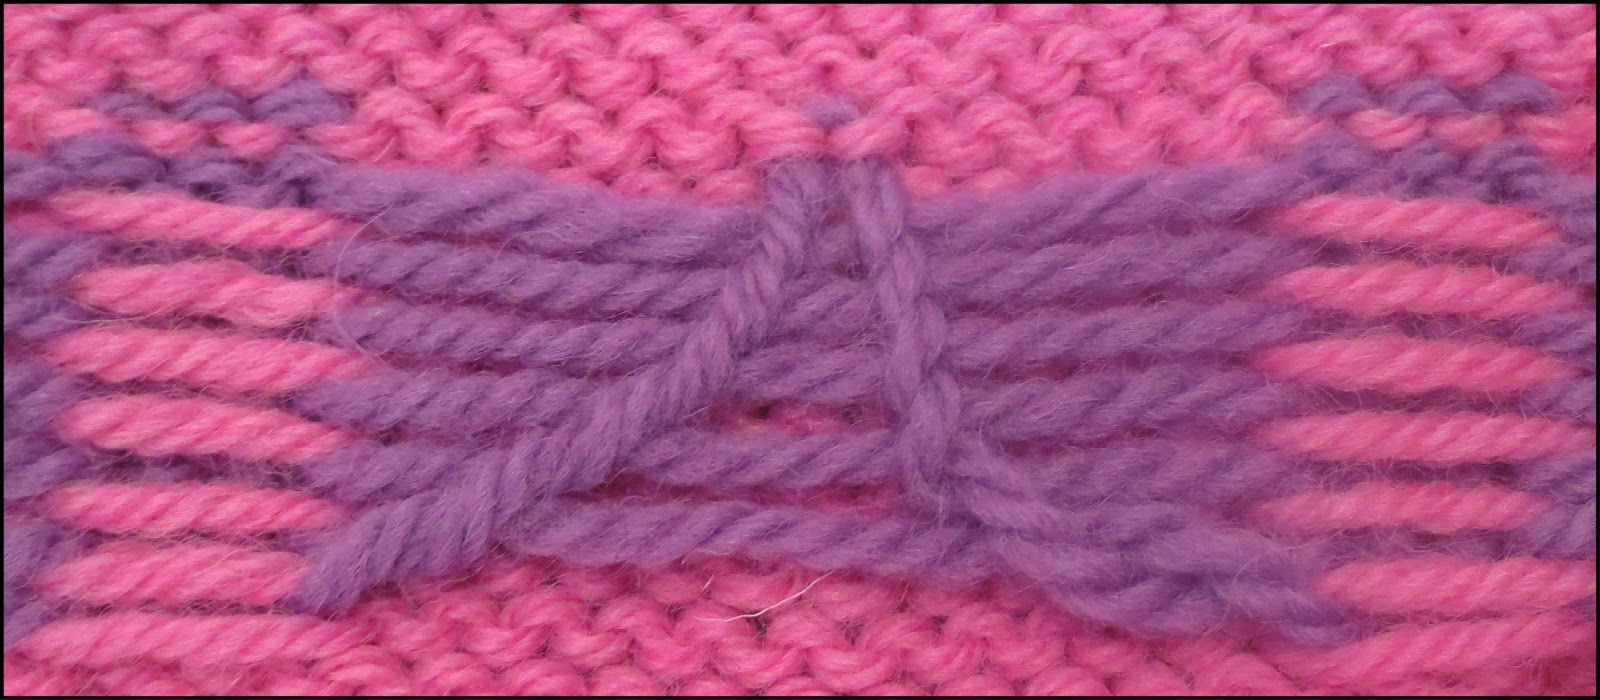 Knitting Jacquard Stitch : TECHknitting: Taming long floats via the STUART method for color-knitting